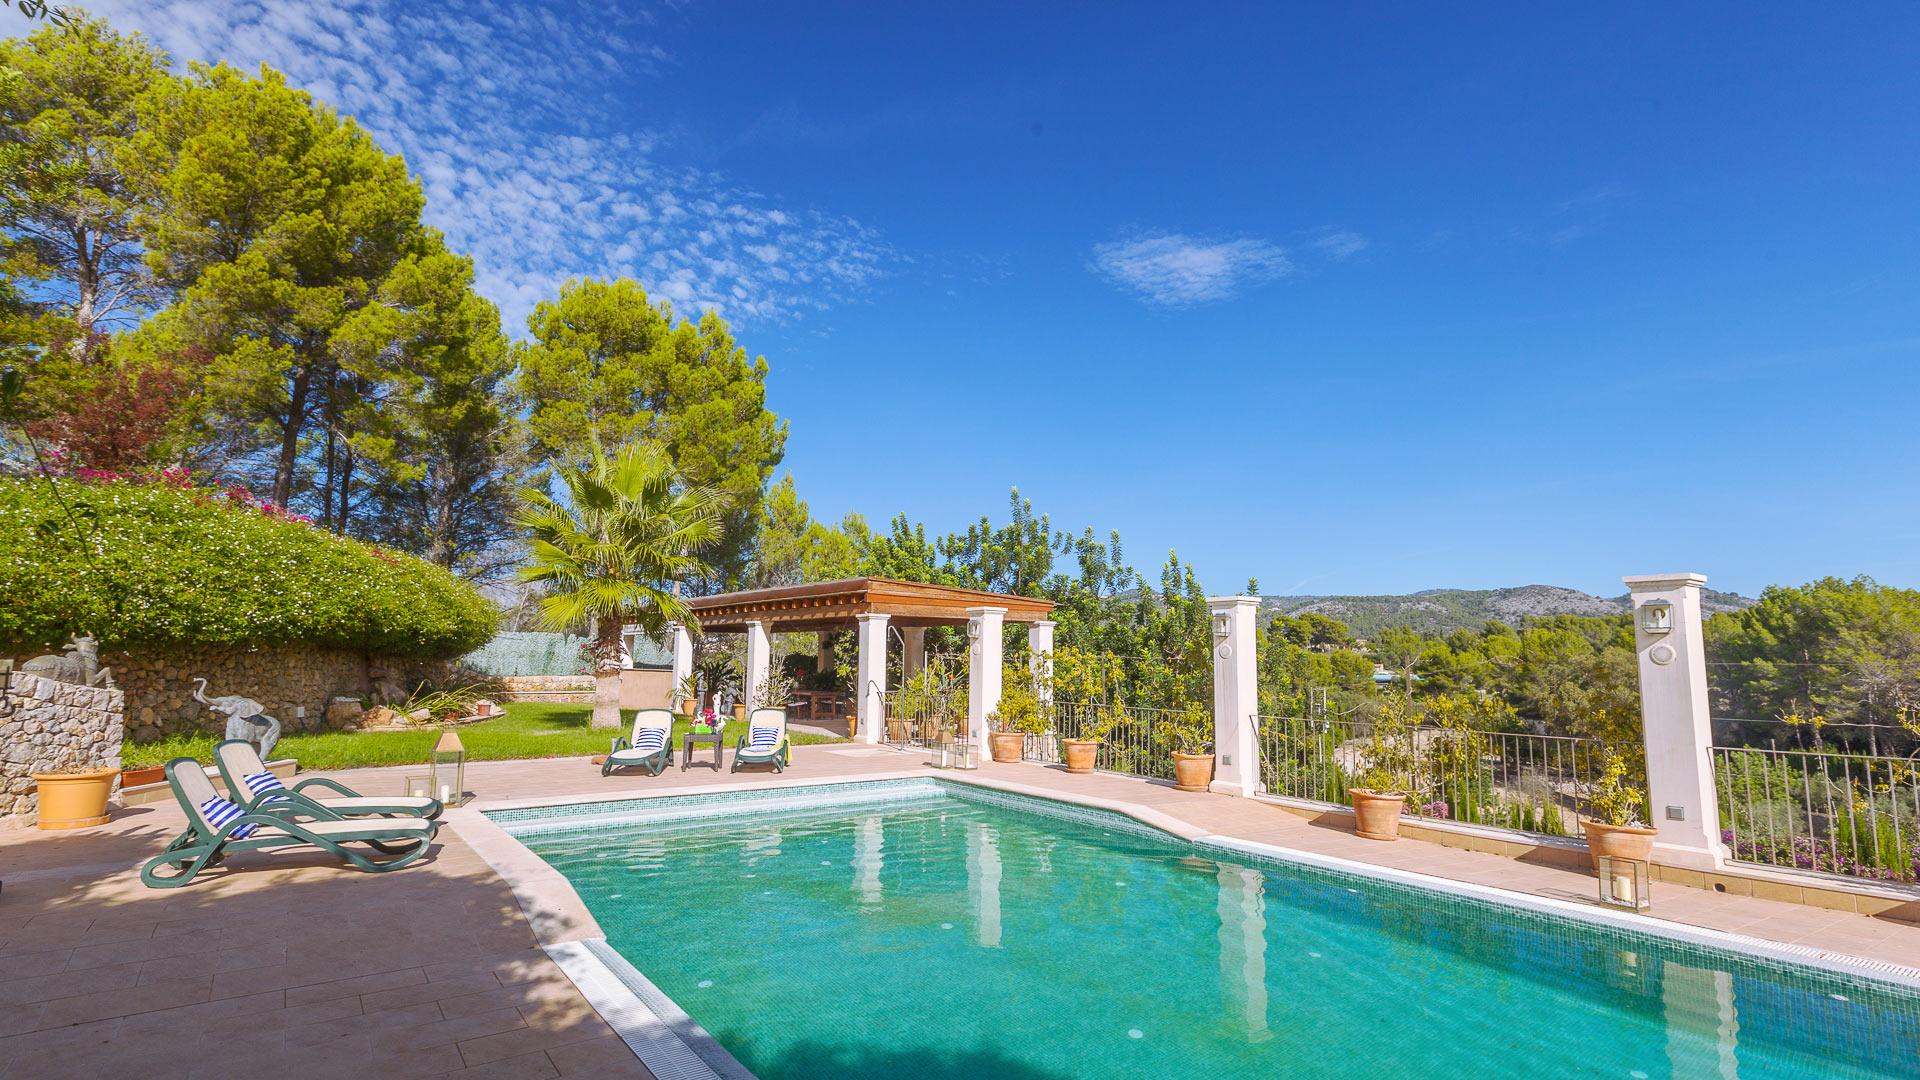 Villa Caridad Villa Mieten In Mallorca S Dwesten